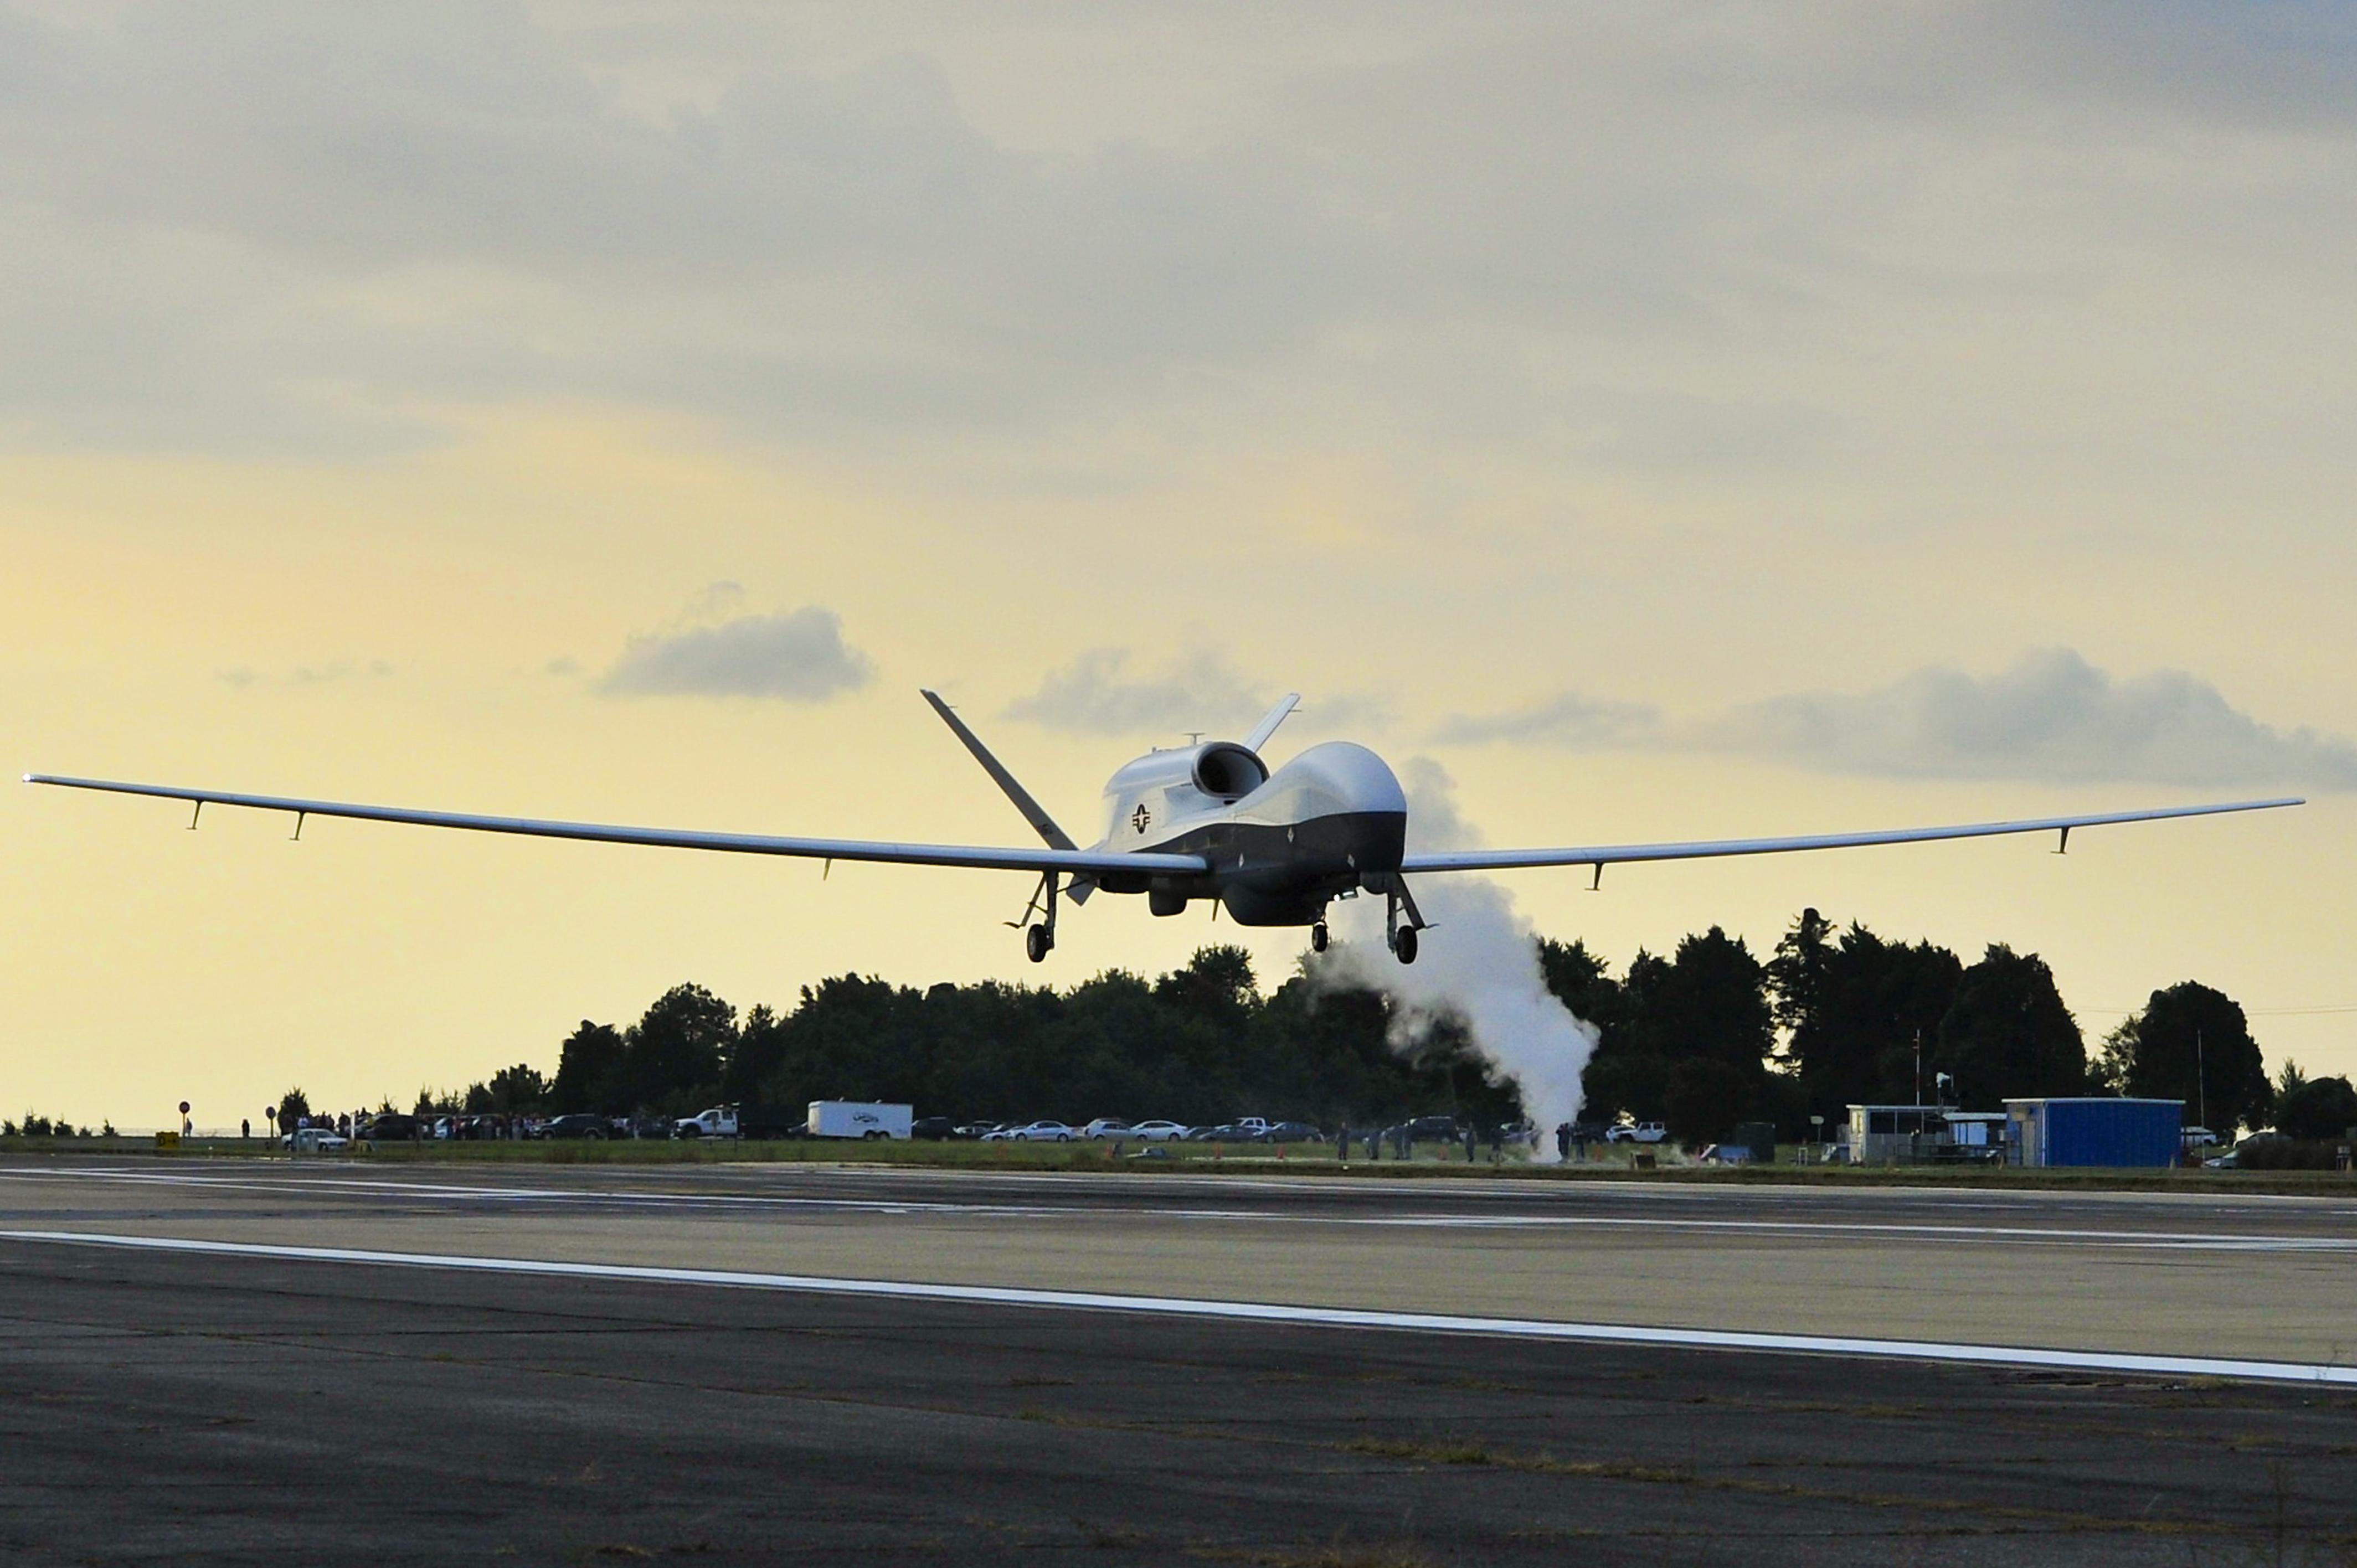 Mq 4c Triton Uas Completes Operational Assessment